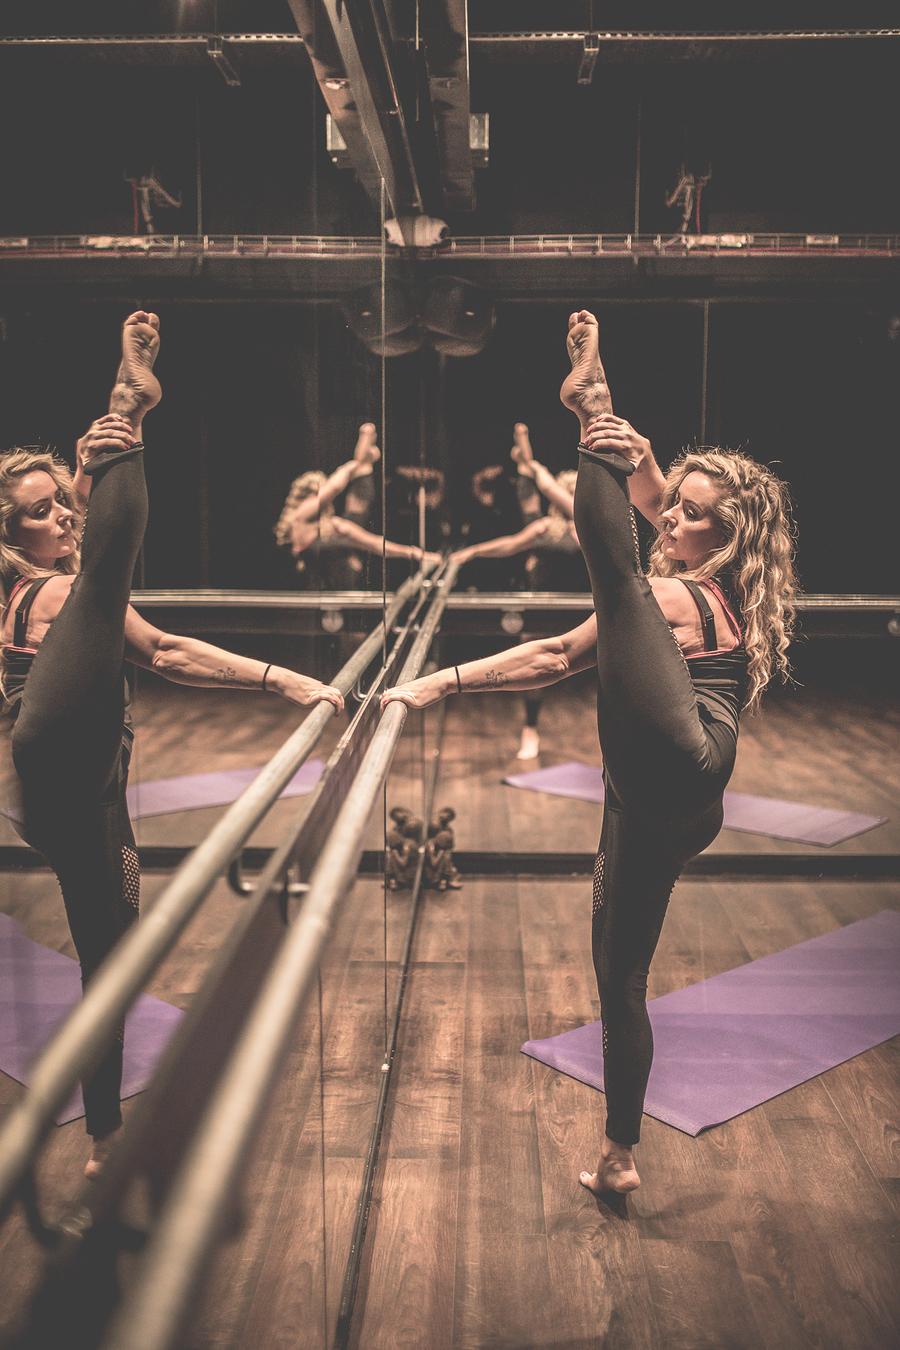 Flexibility yoga pose / Model Clairesavannah / Uploaded 30th June 2019 @ 11:57 PM